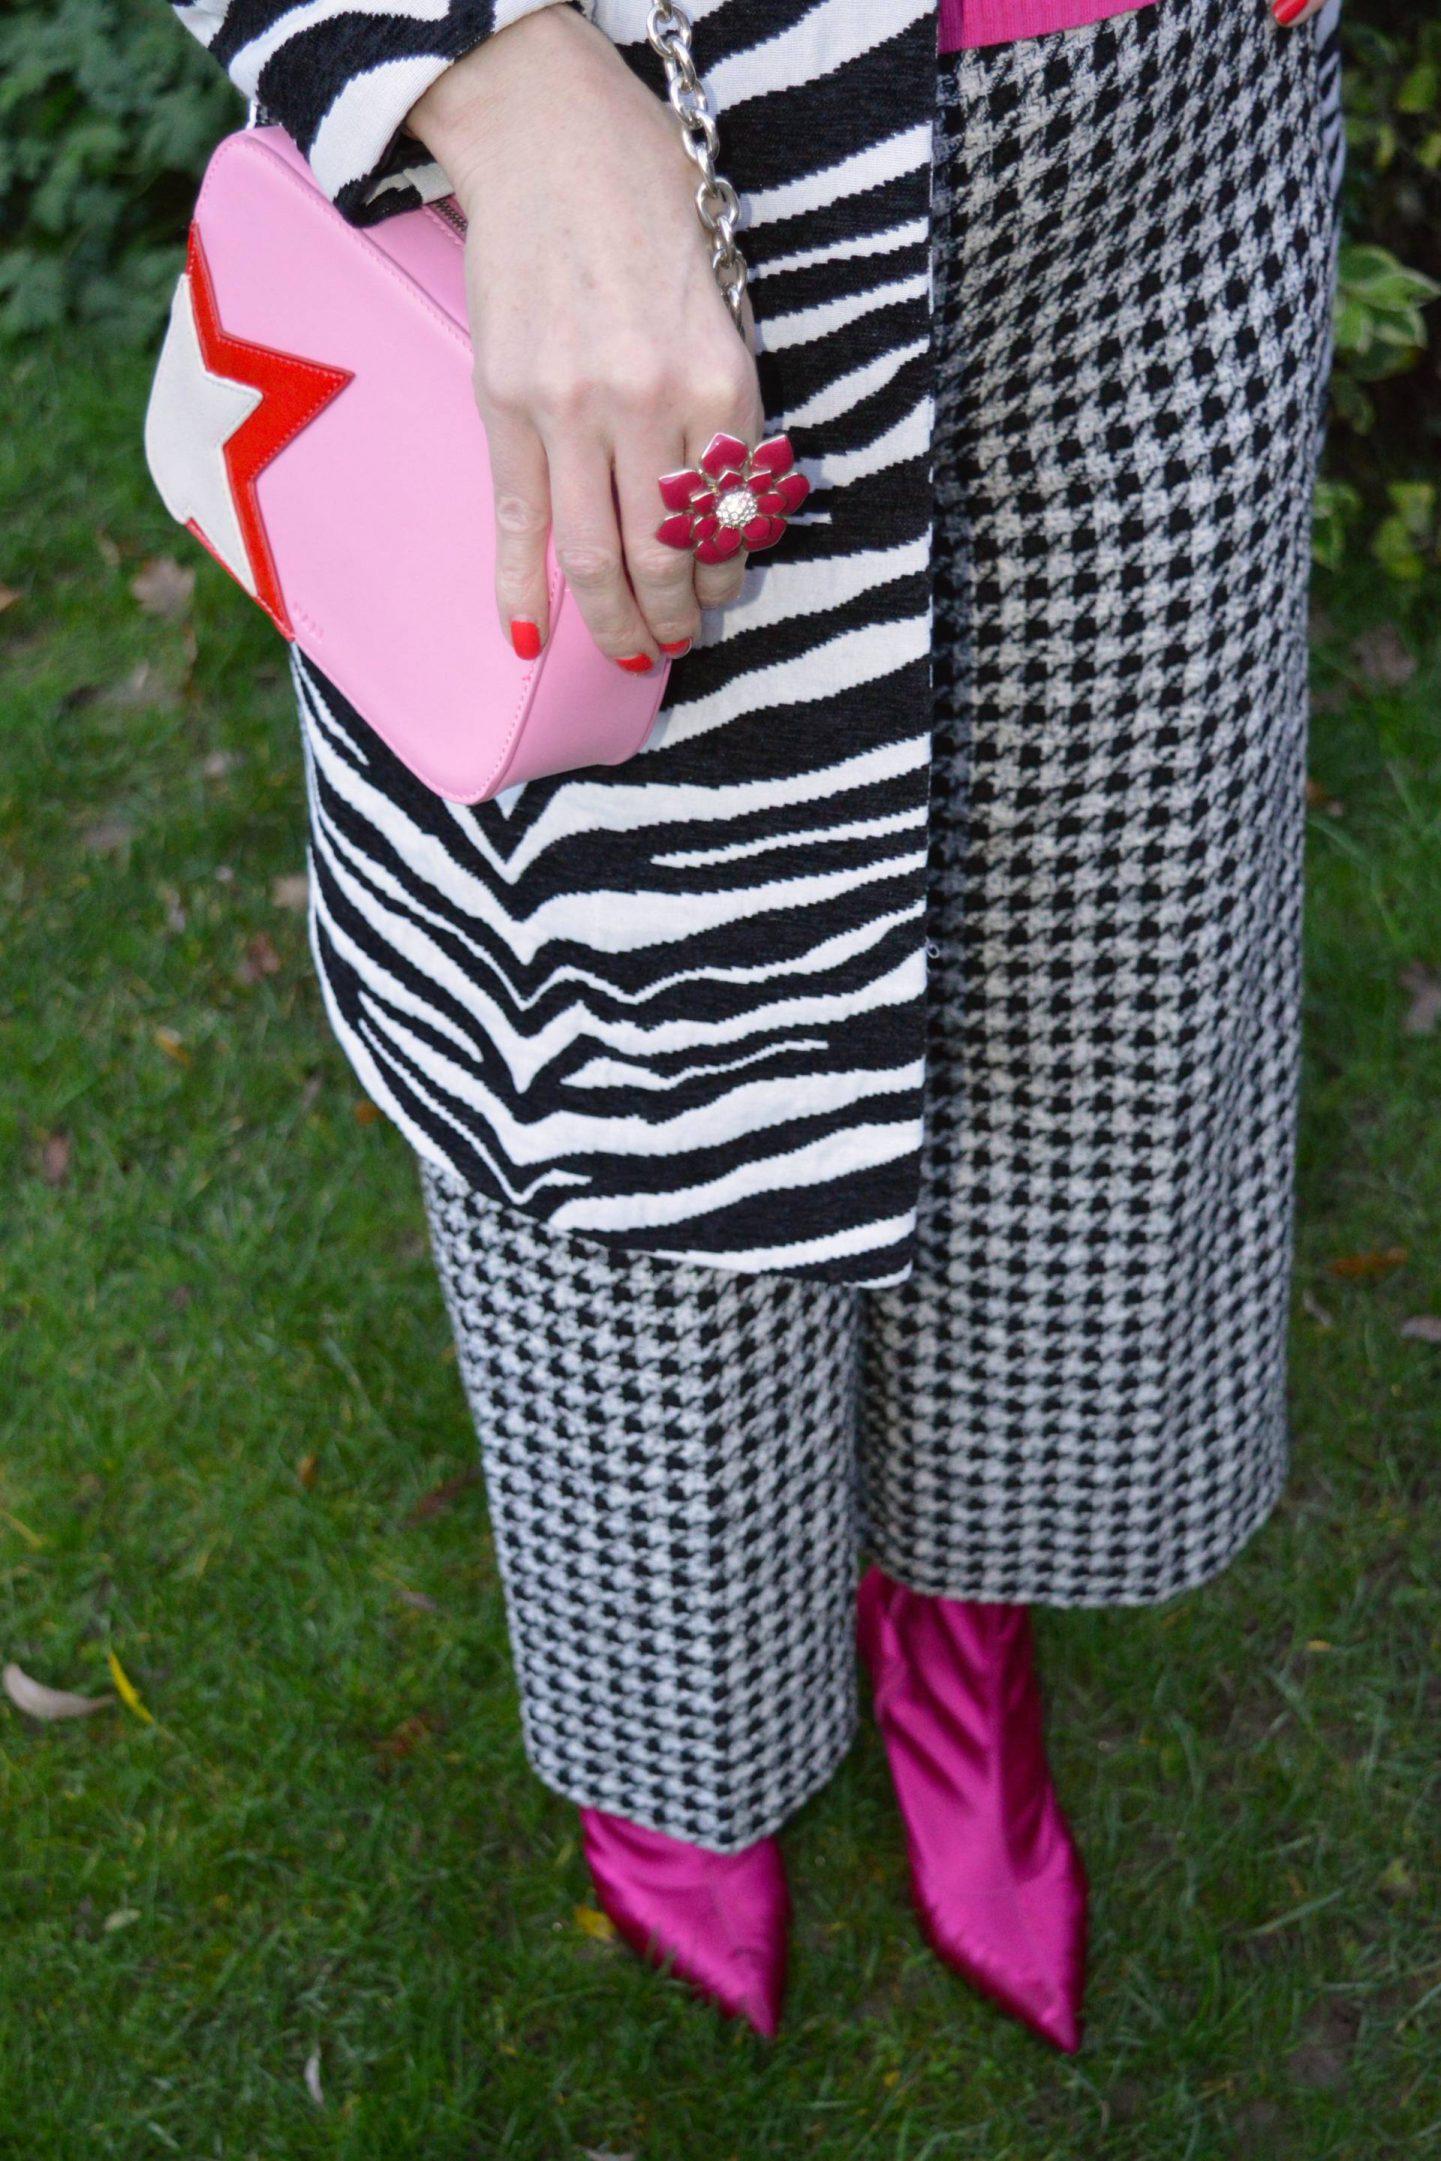 Zara houndstooth trousers, Marks & Spencer pink satin sock boots, pink star motif crossbody bag